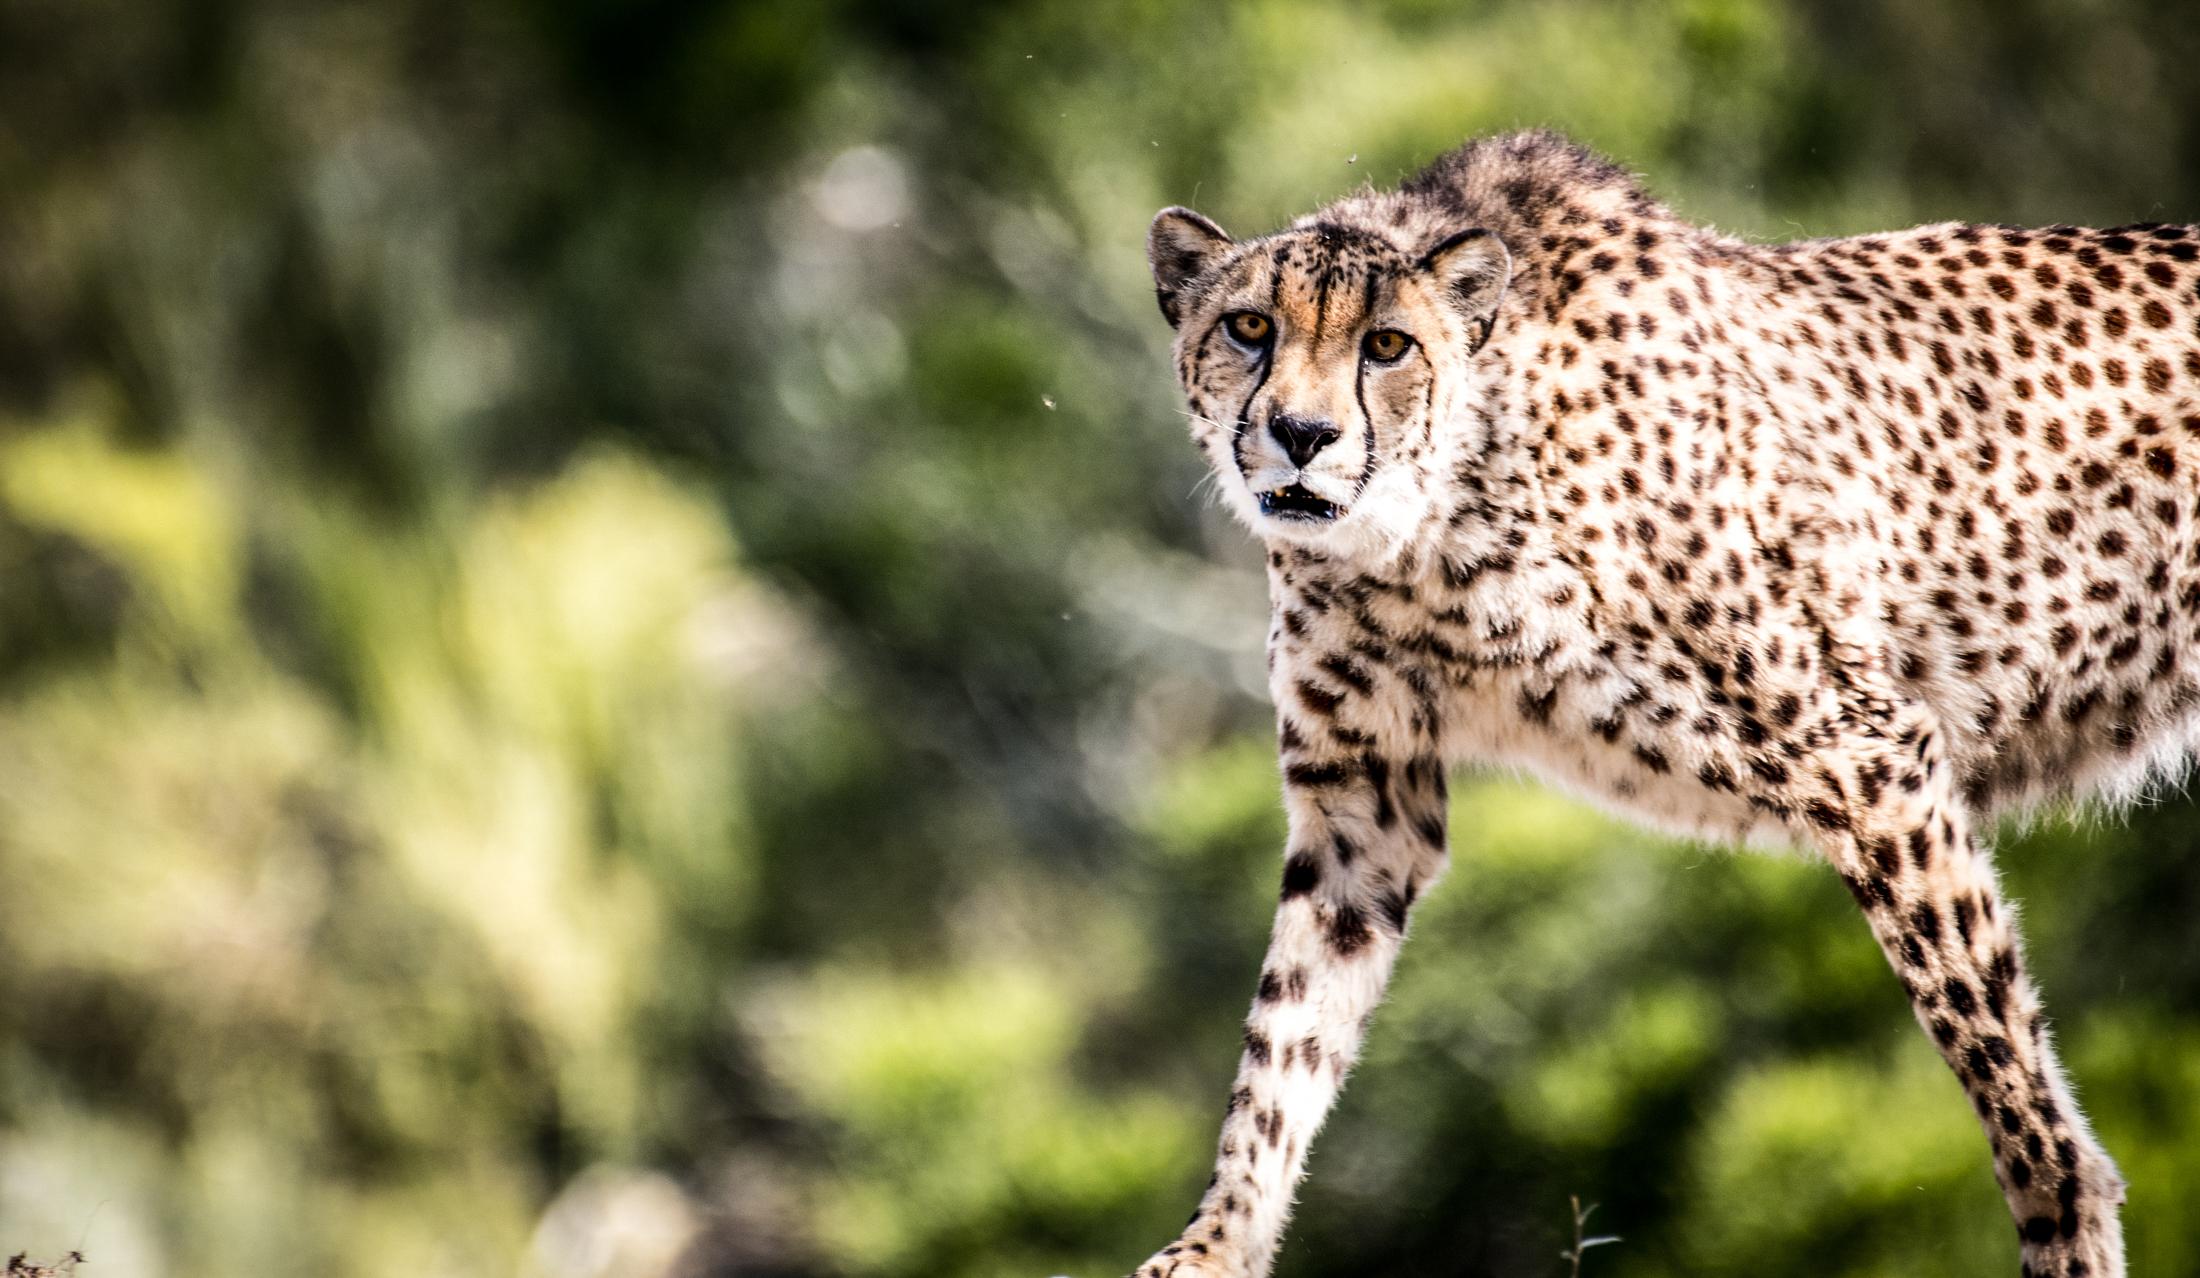 500mm handheld f5.6 640sec_leopard.jpg